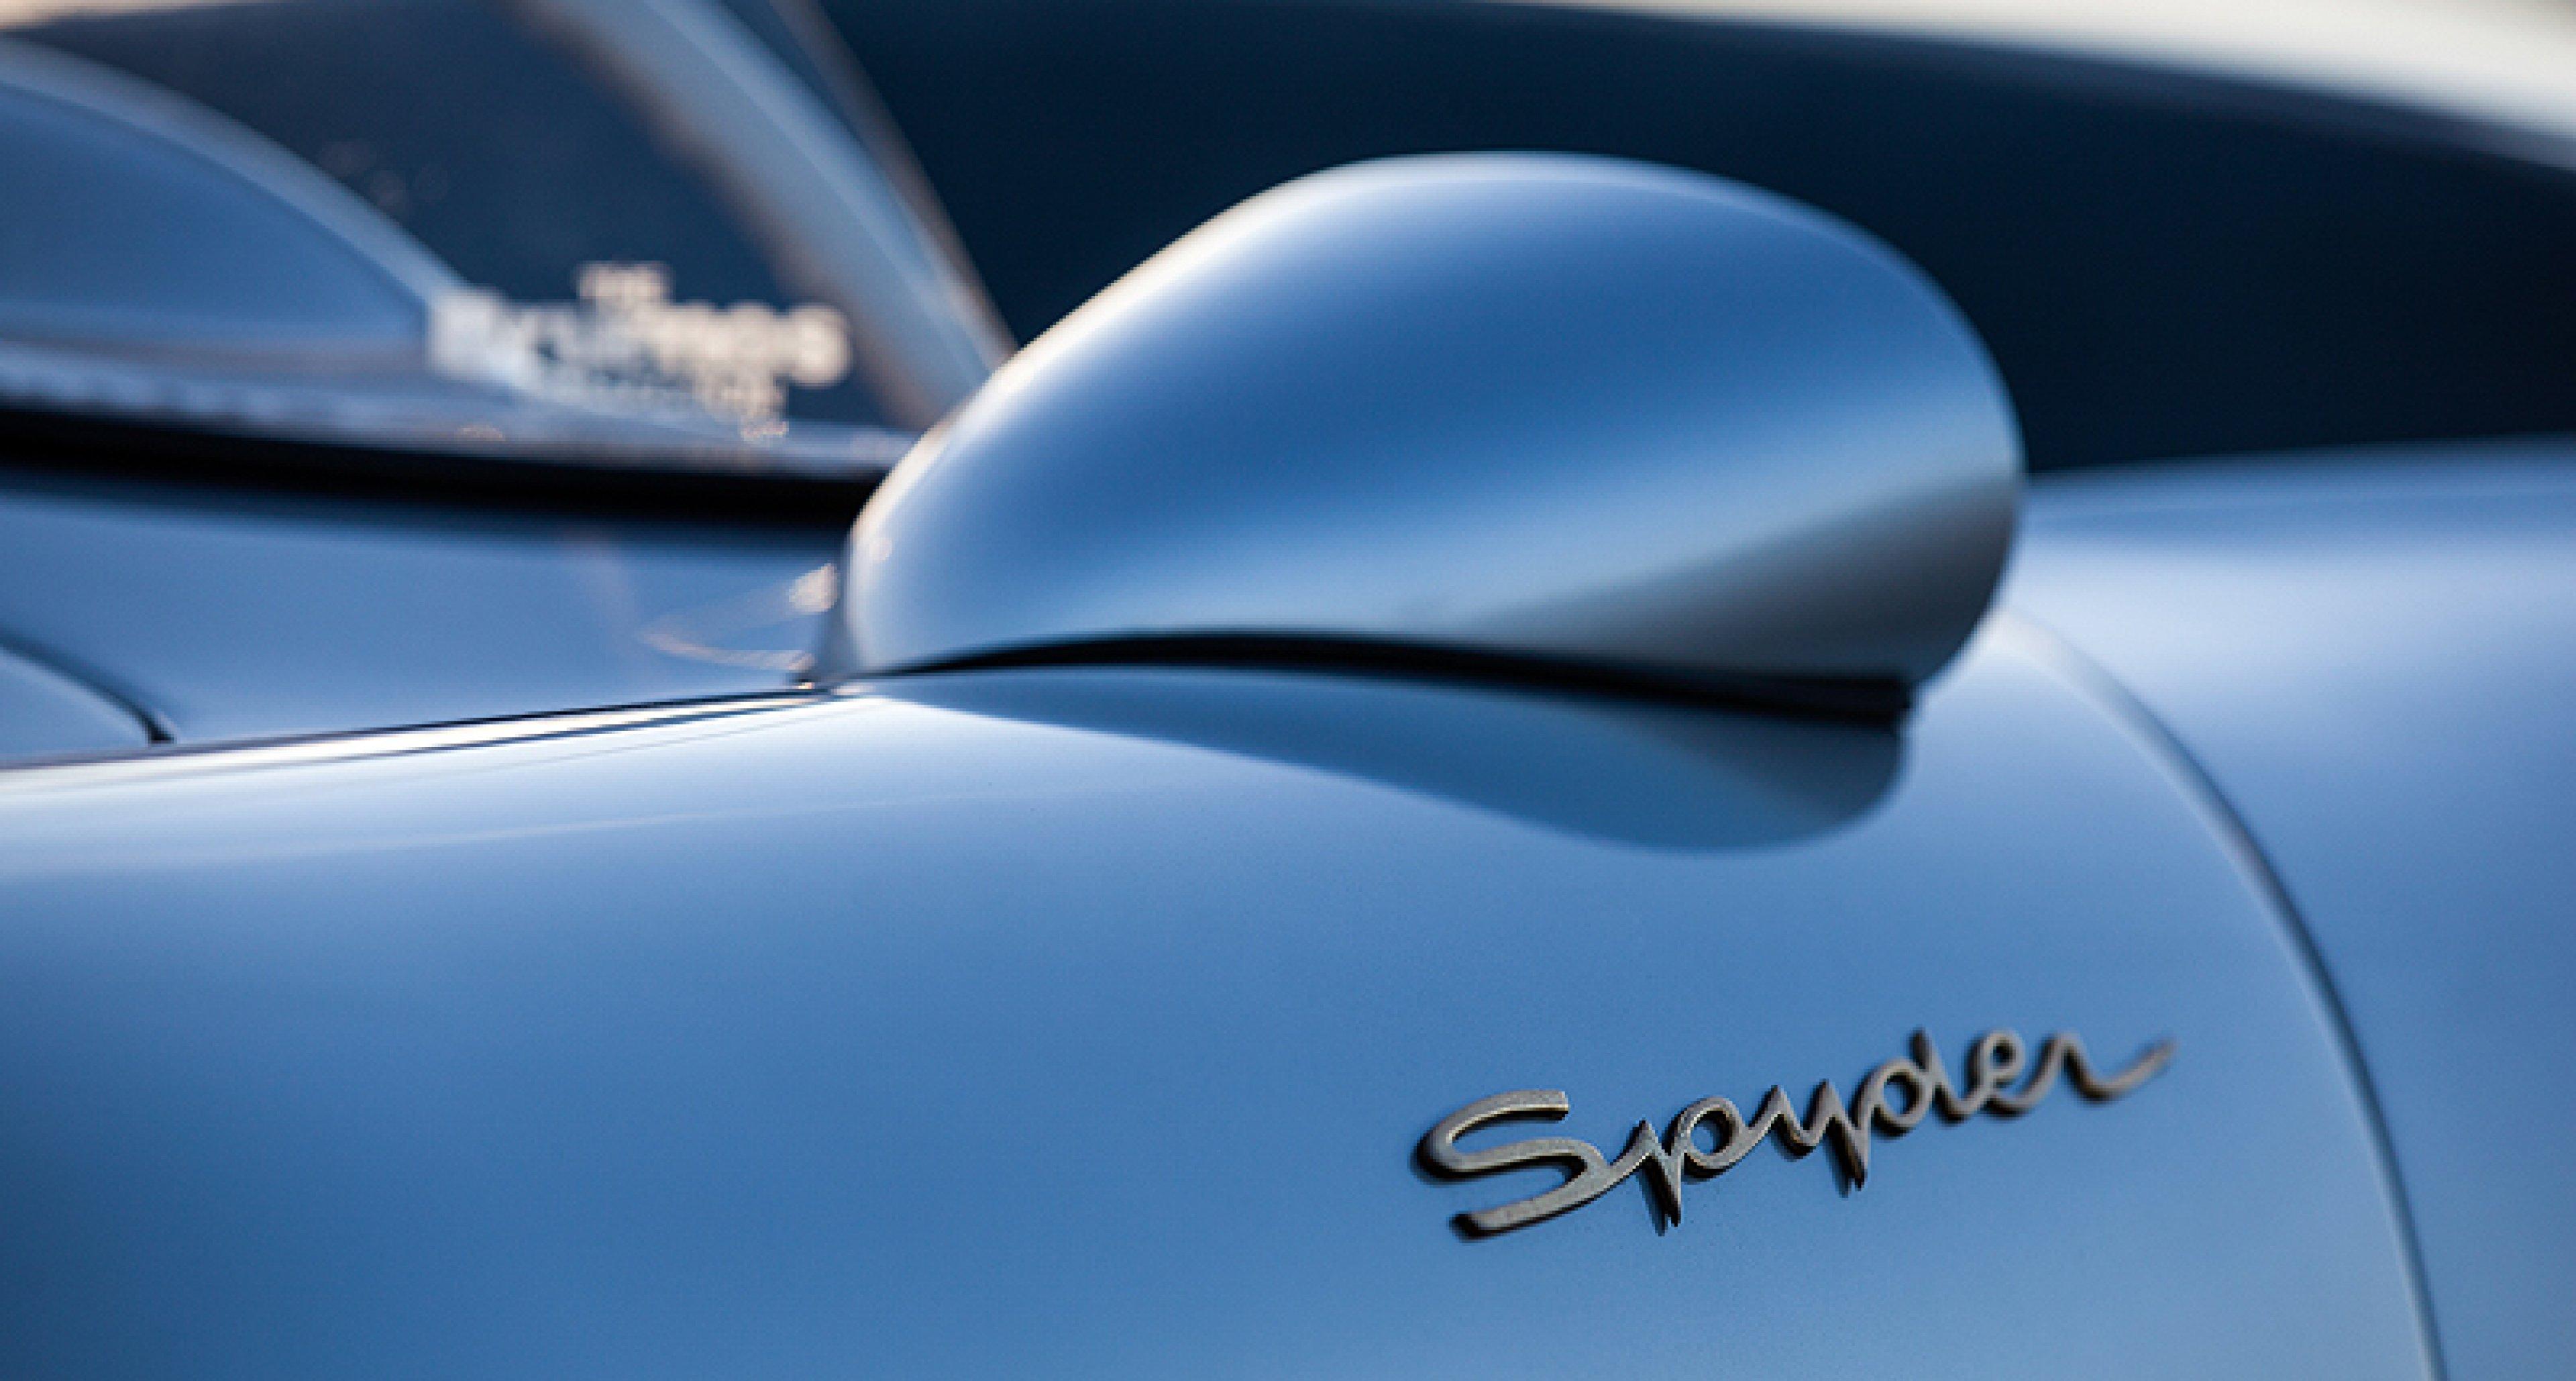 The 'Operation Caracas' Porsche 550 Spyder: Brother of the 'Little Bastard'